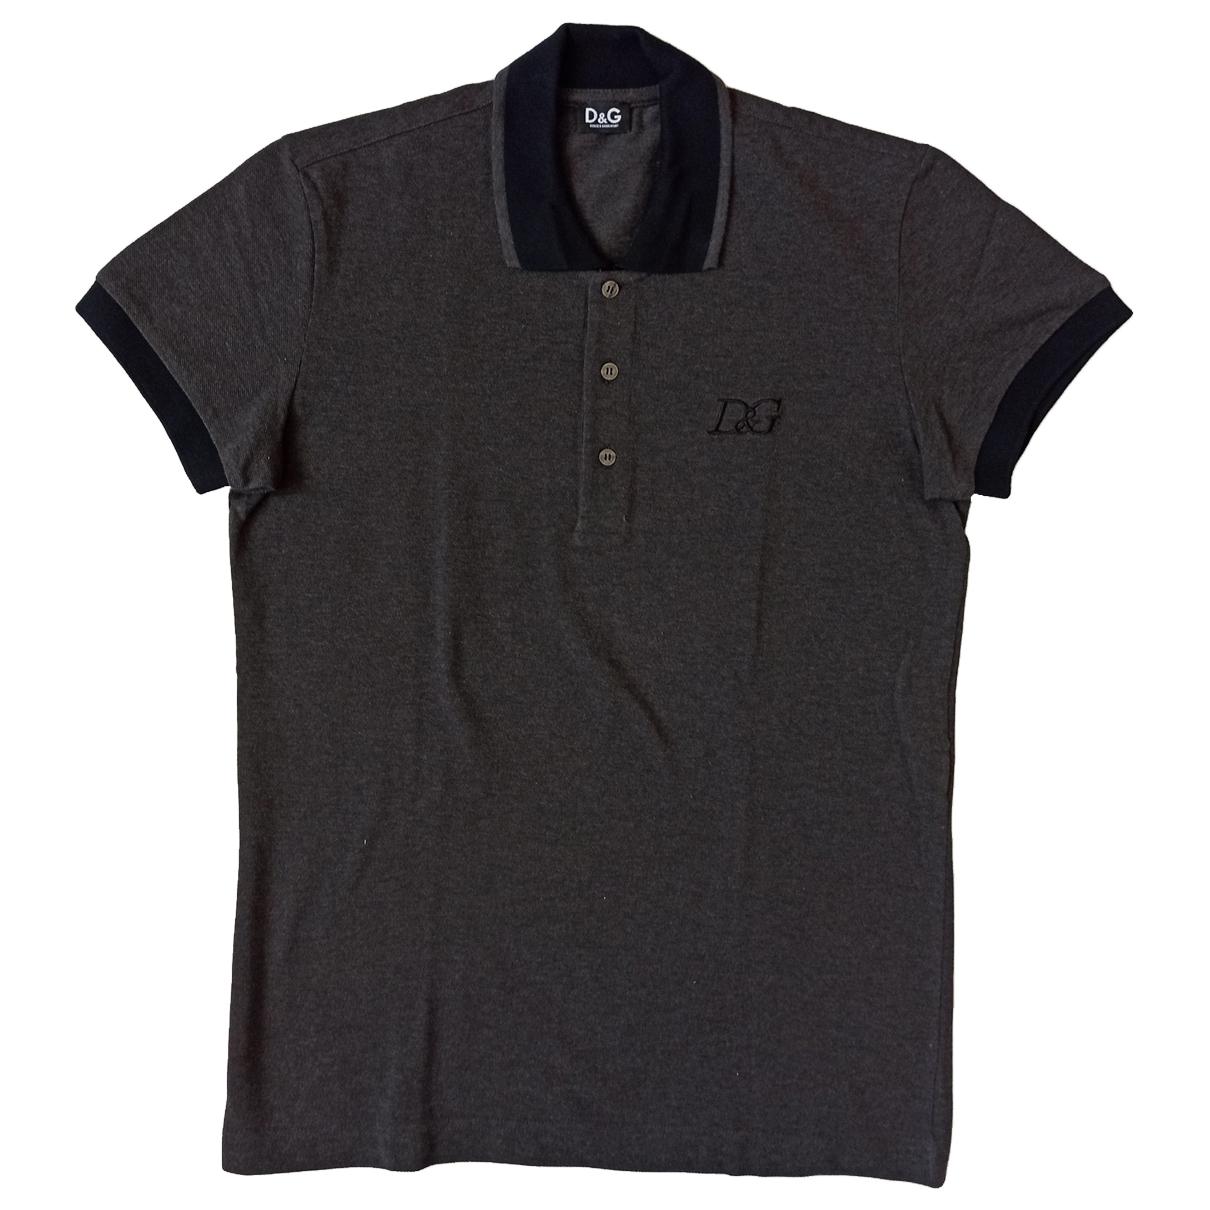 D&g \N Grey Cotton Polo shirts for Men M International